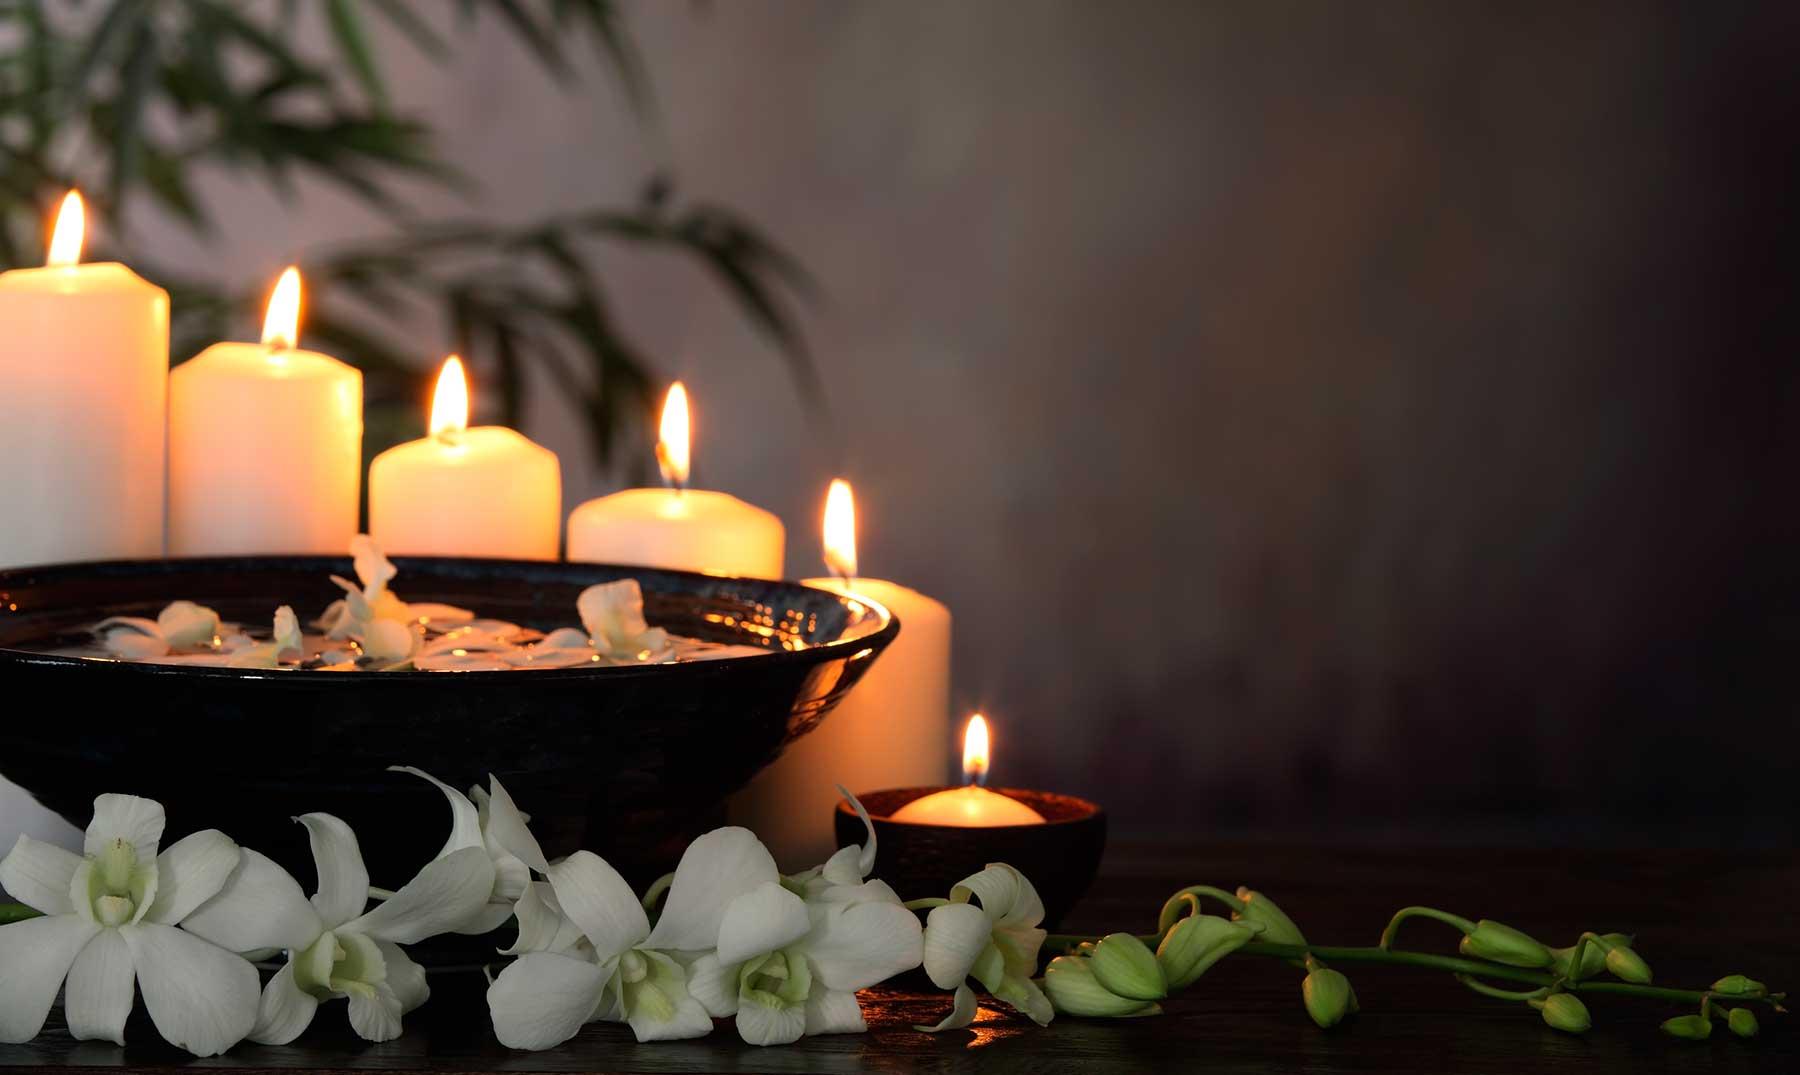 15 consejos de feng shui para una casa repleta de energ a positiva supercurioso - Consejos de feng shui ...